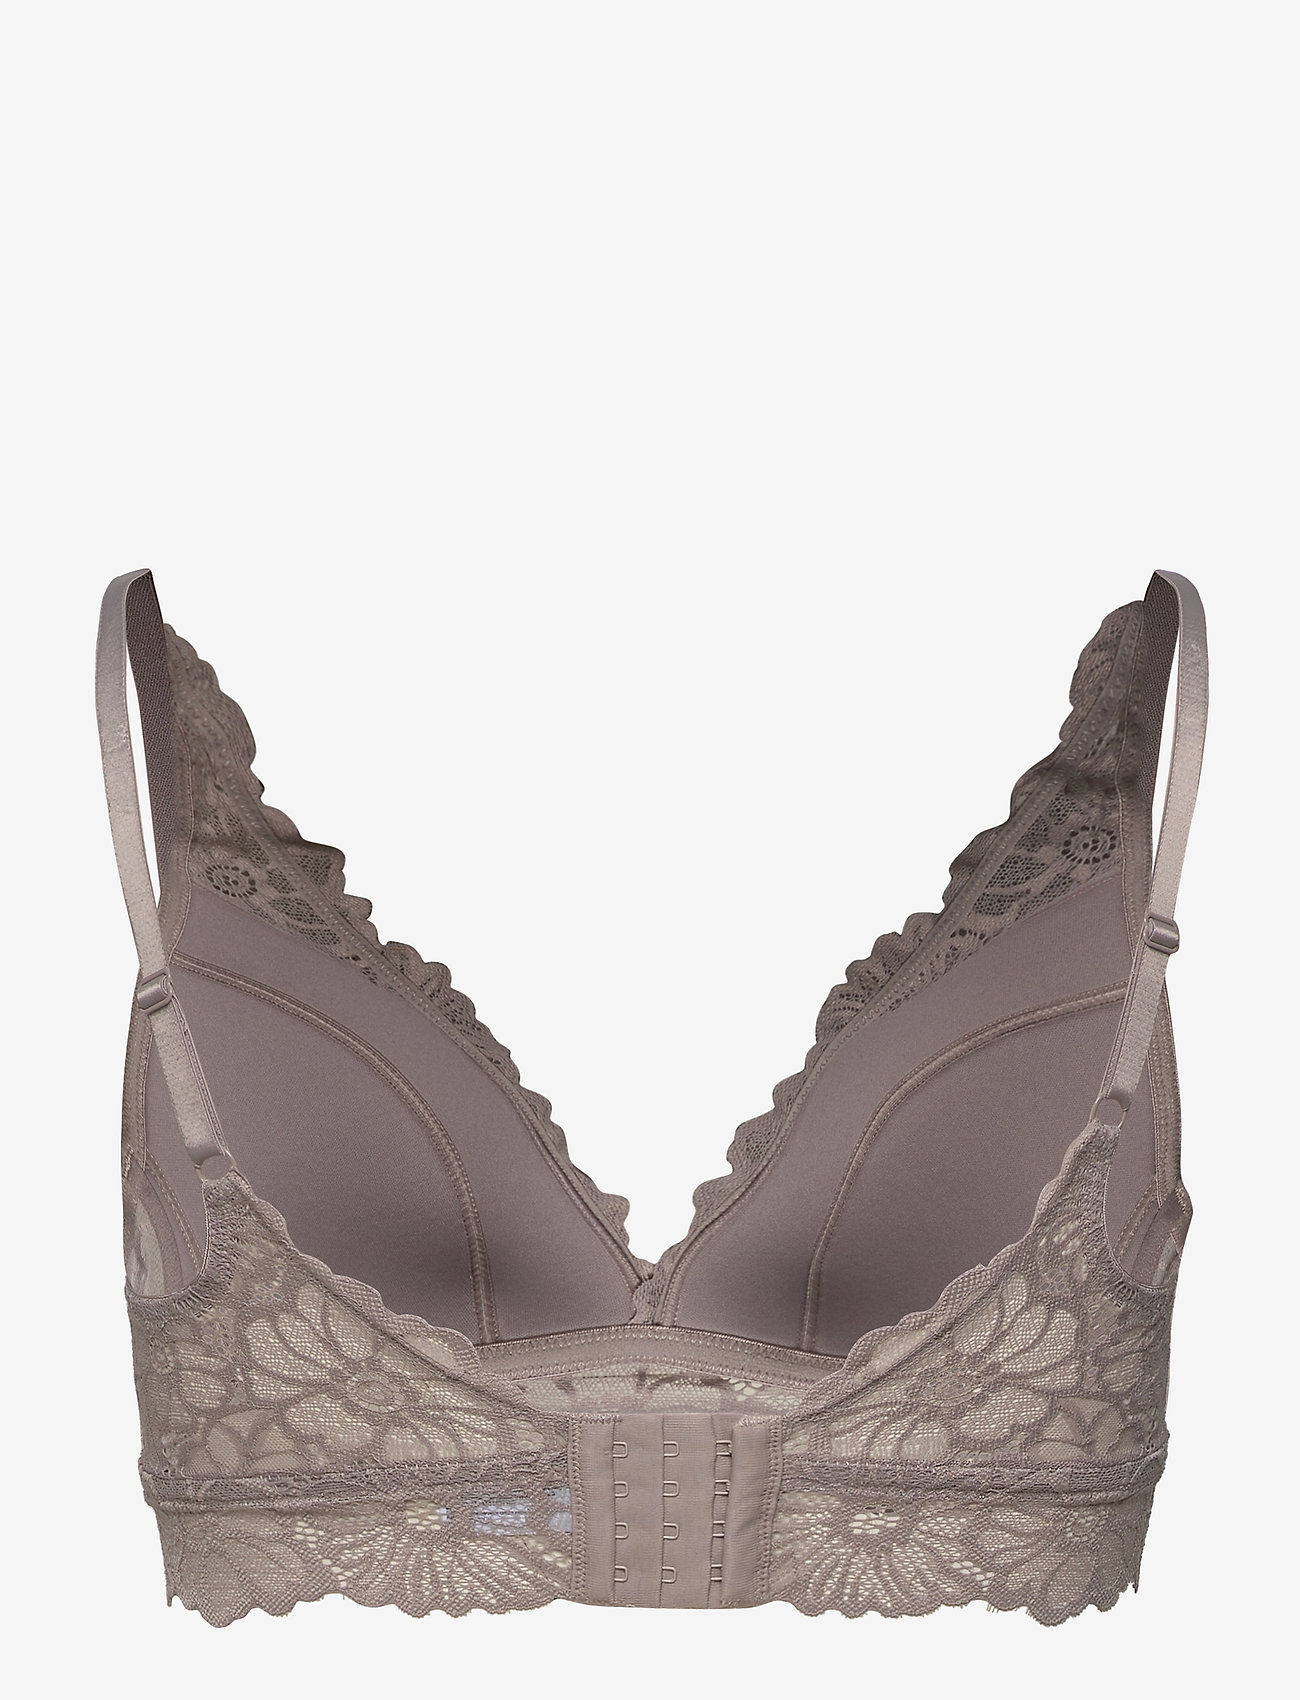 Esprit Bodywear Women - Bras wireless - bralette & corset - light taupe - 1